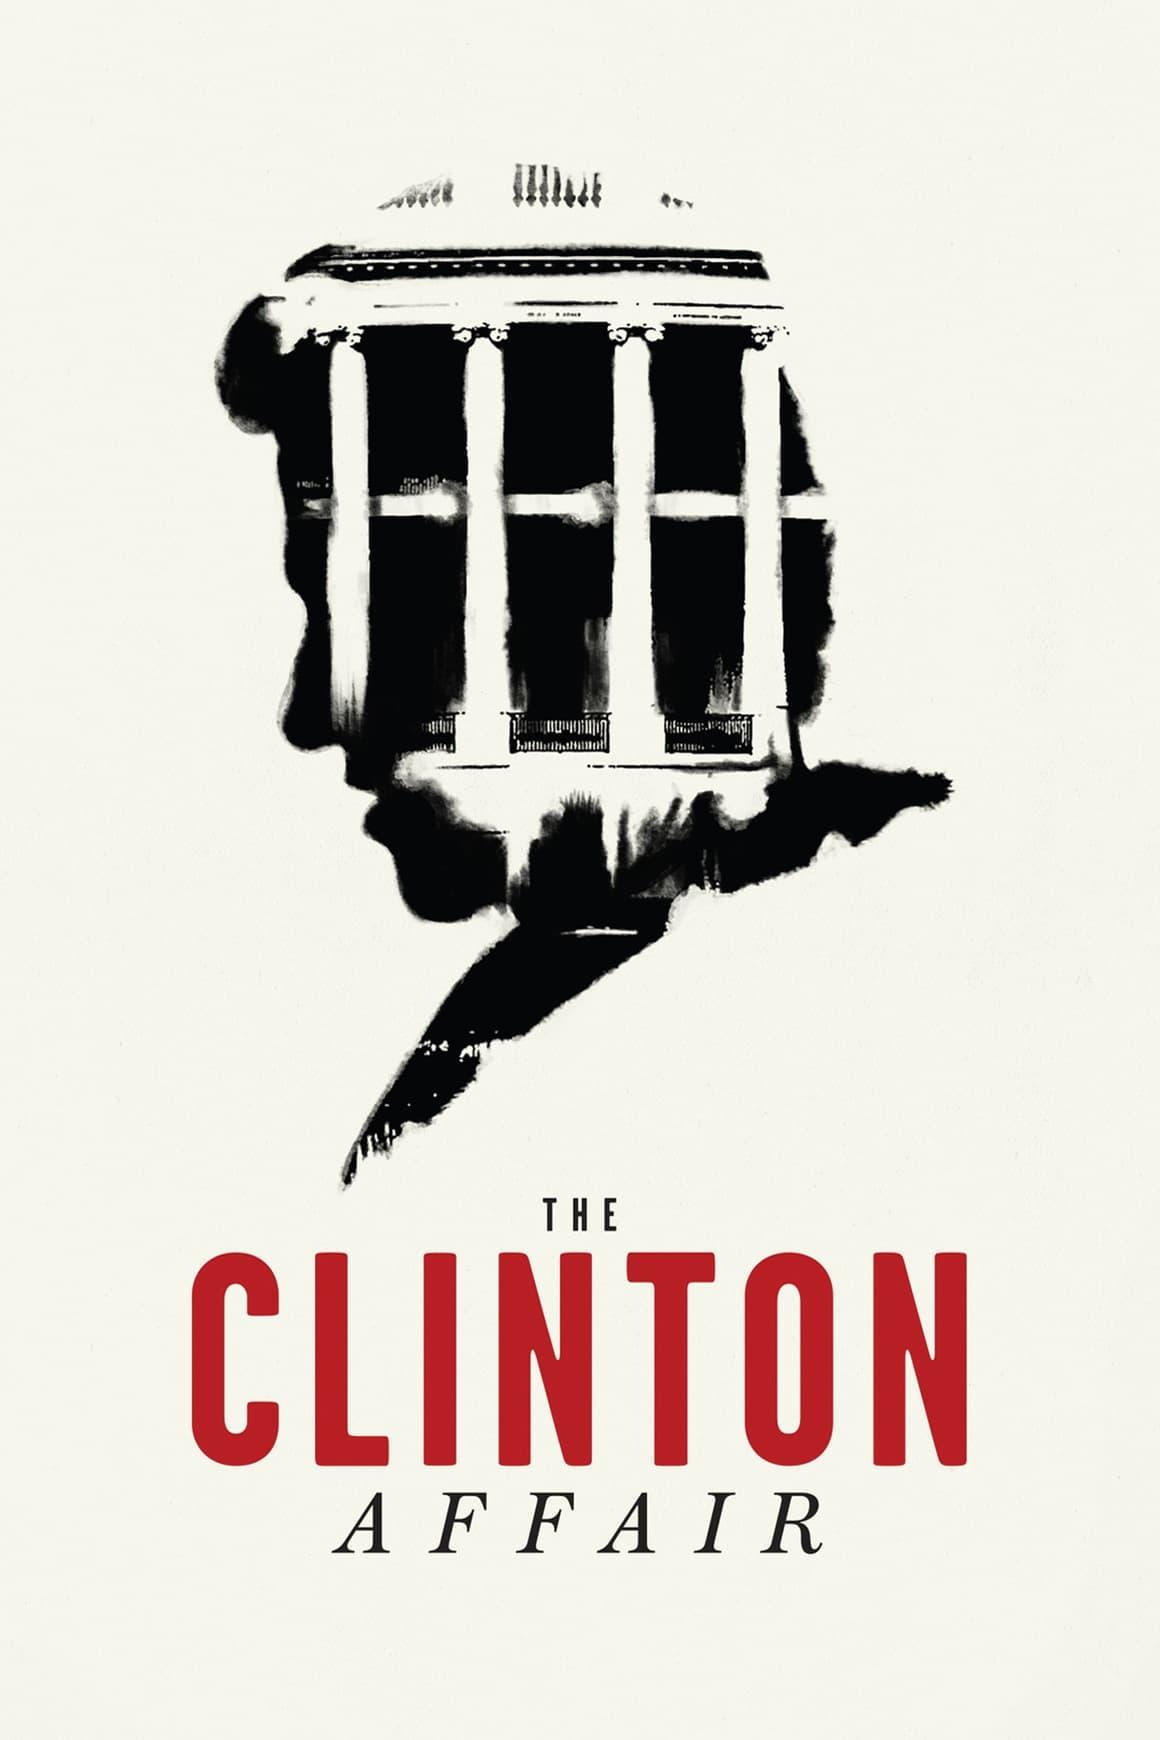 The Clinton Affair